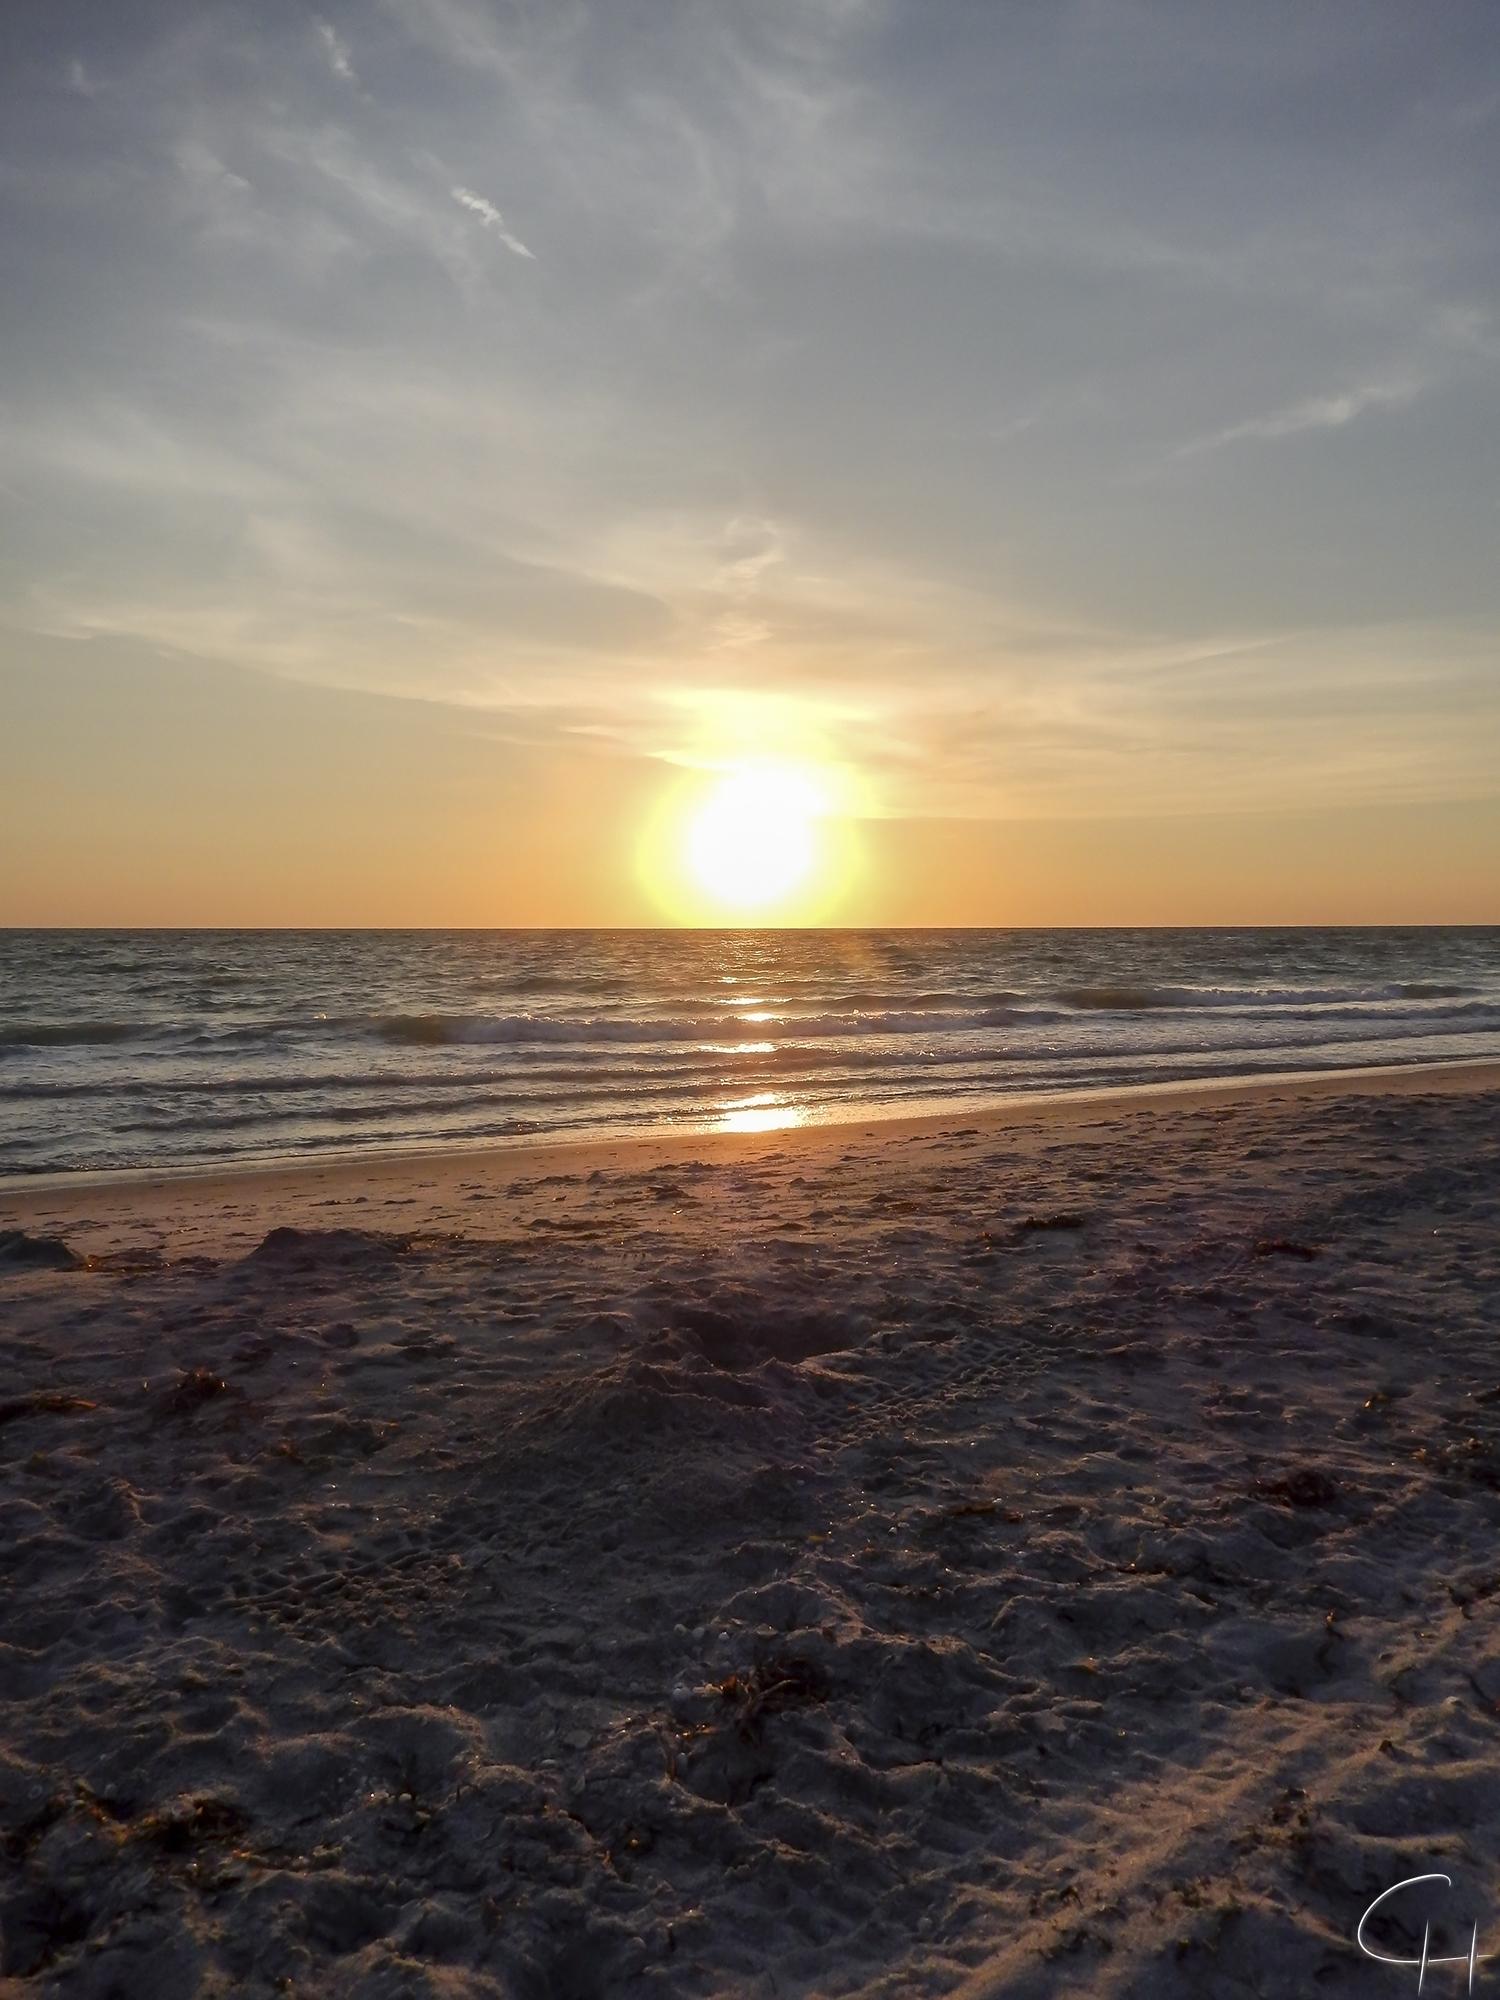 Captiva Sunset by Chillstice